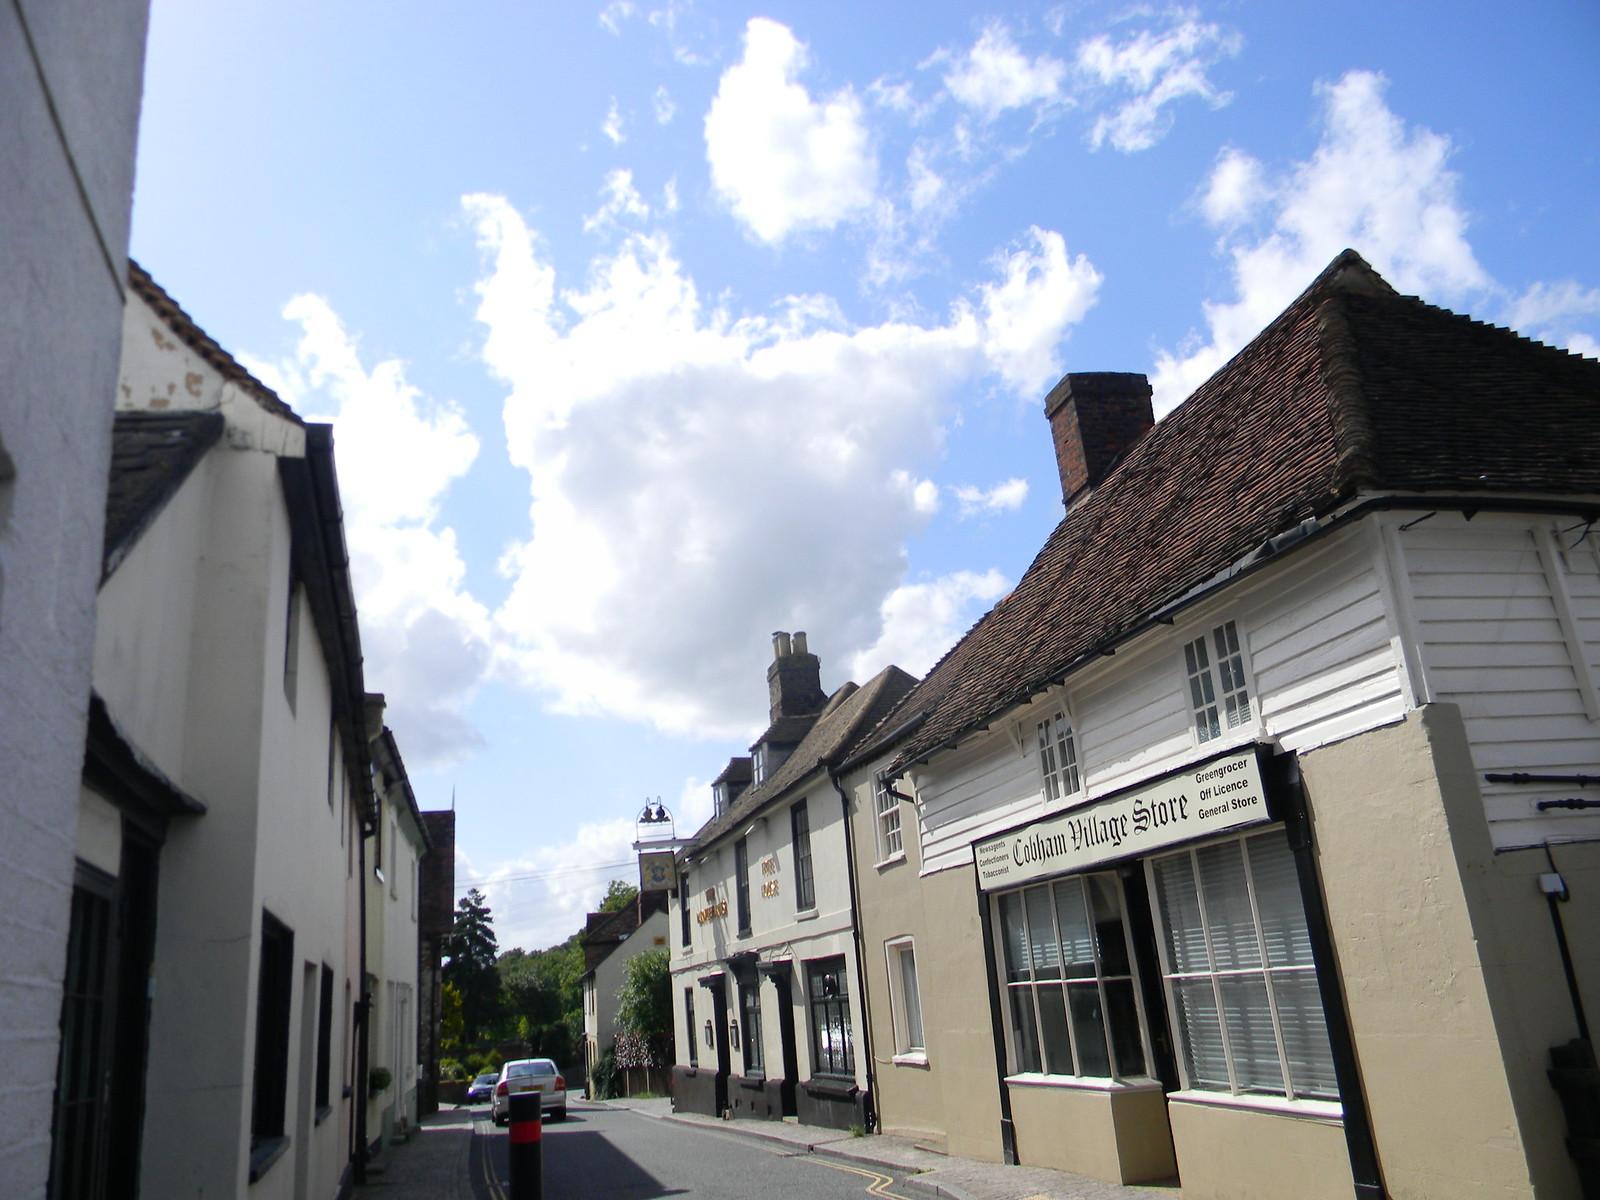 "Cobham ""Street"" Cuxton to Sole Street"